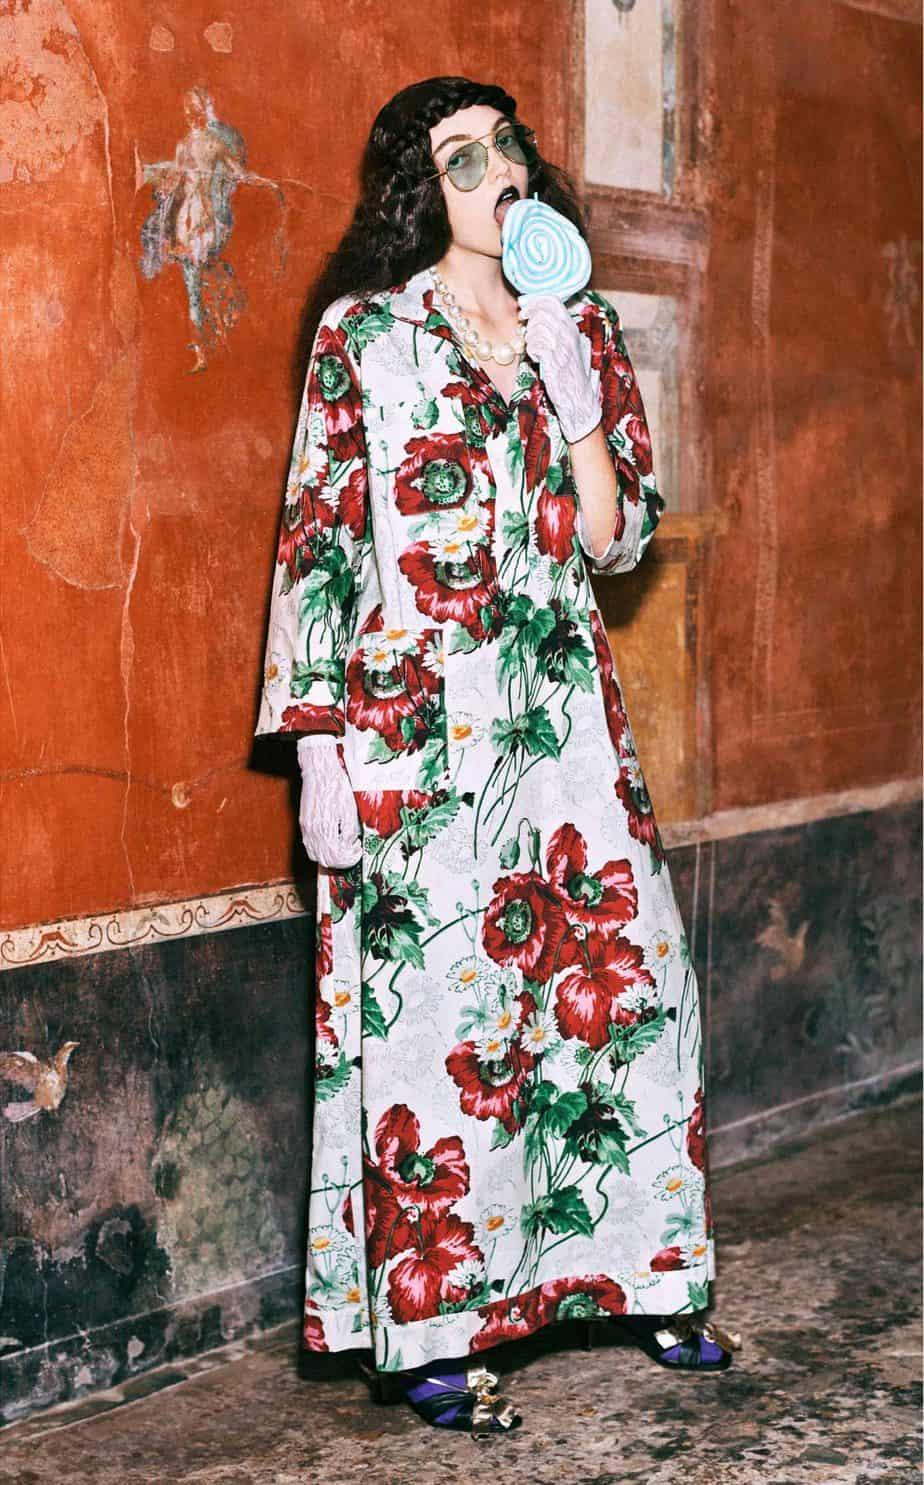 GUCCI, FALL 2019. WOMEN'S FASHION, Photographer Harmony Korine, Art Director, Christopher Simmonds - 16